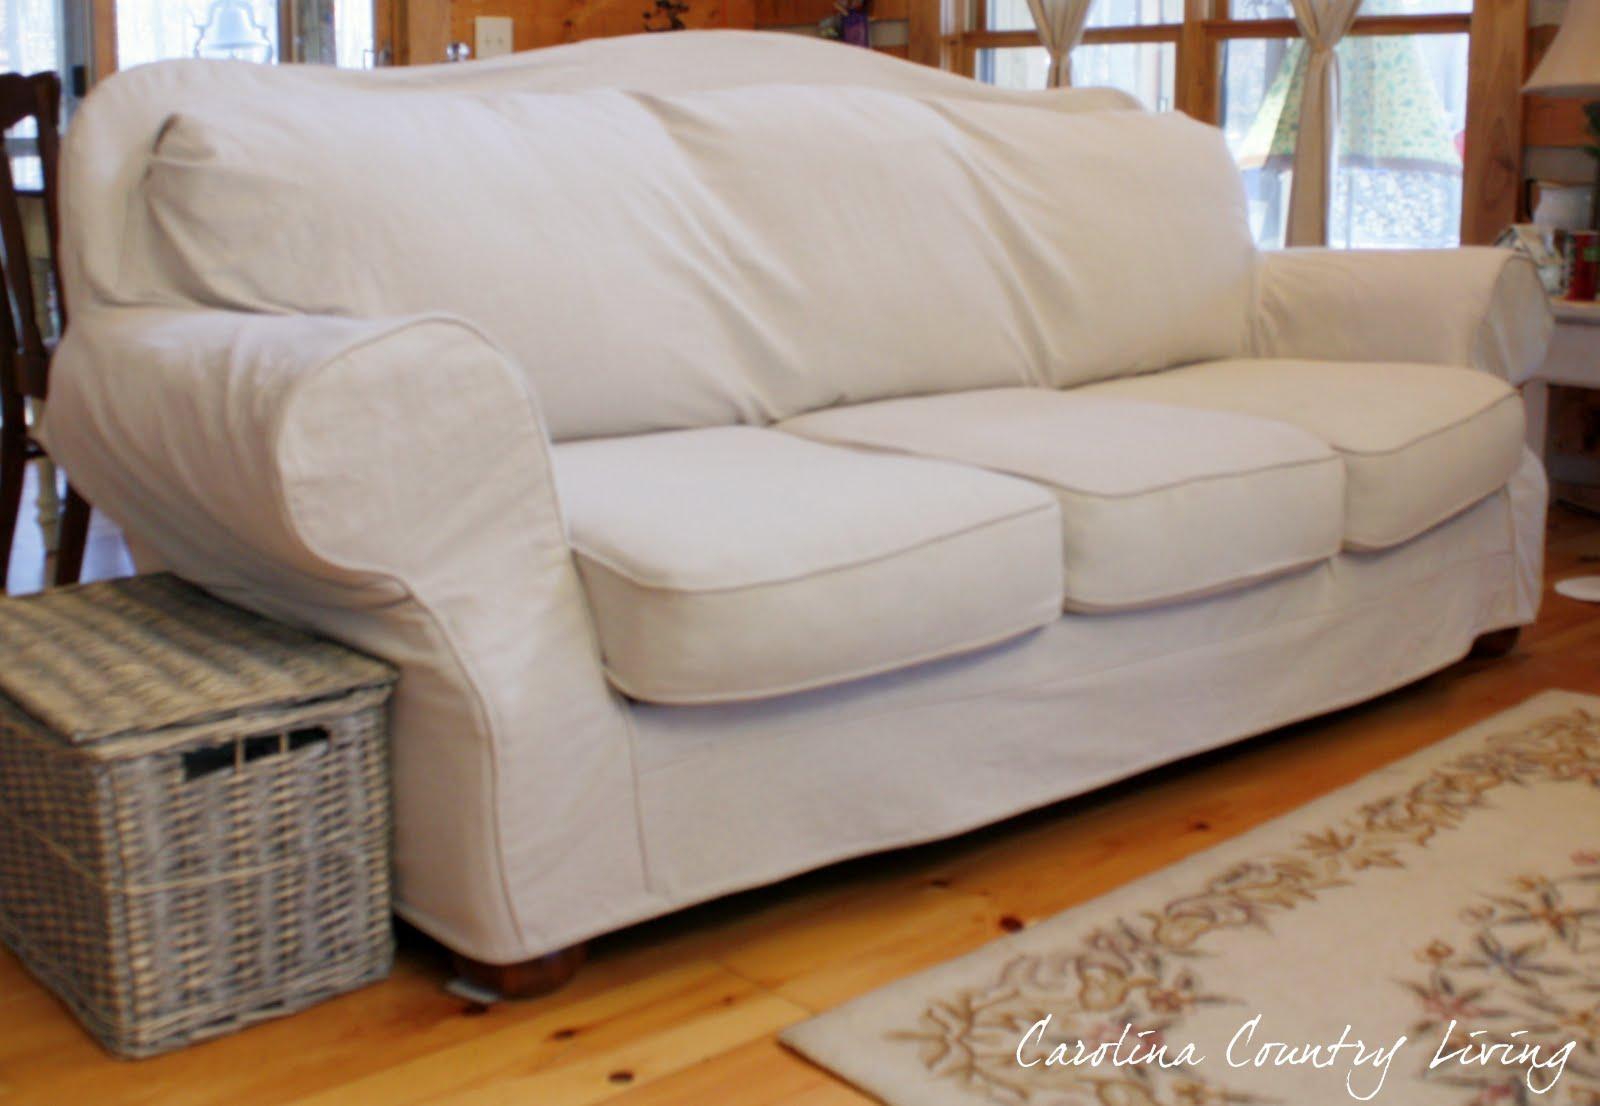 Sofas Center : Cushion Sofa Slipcovers T Style Camel Back Regarding Camelback Slipcovers (Image 16 of 20)